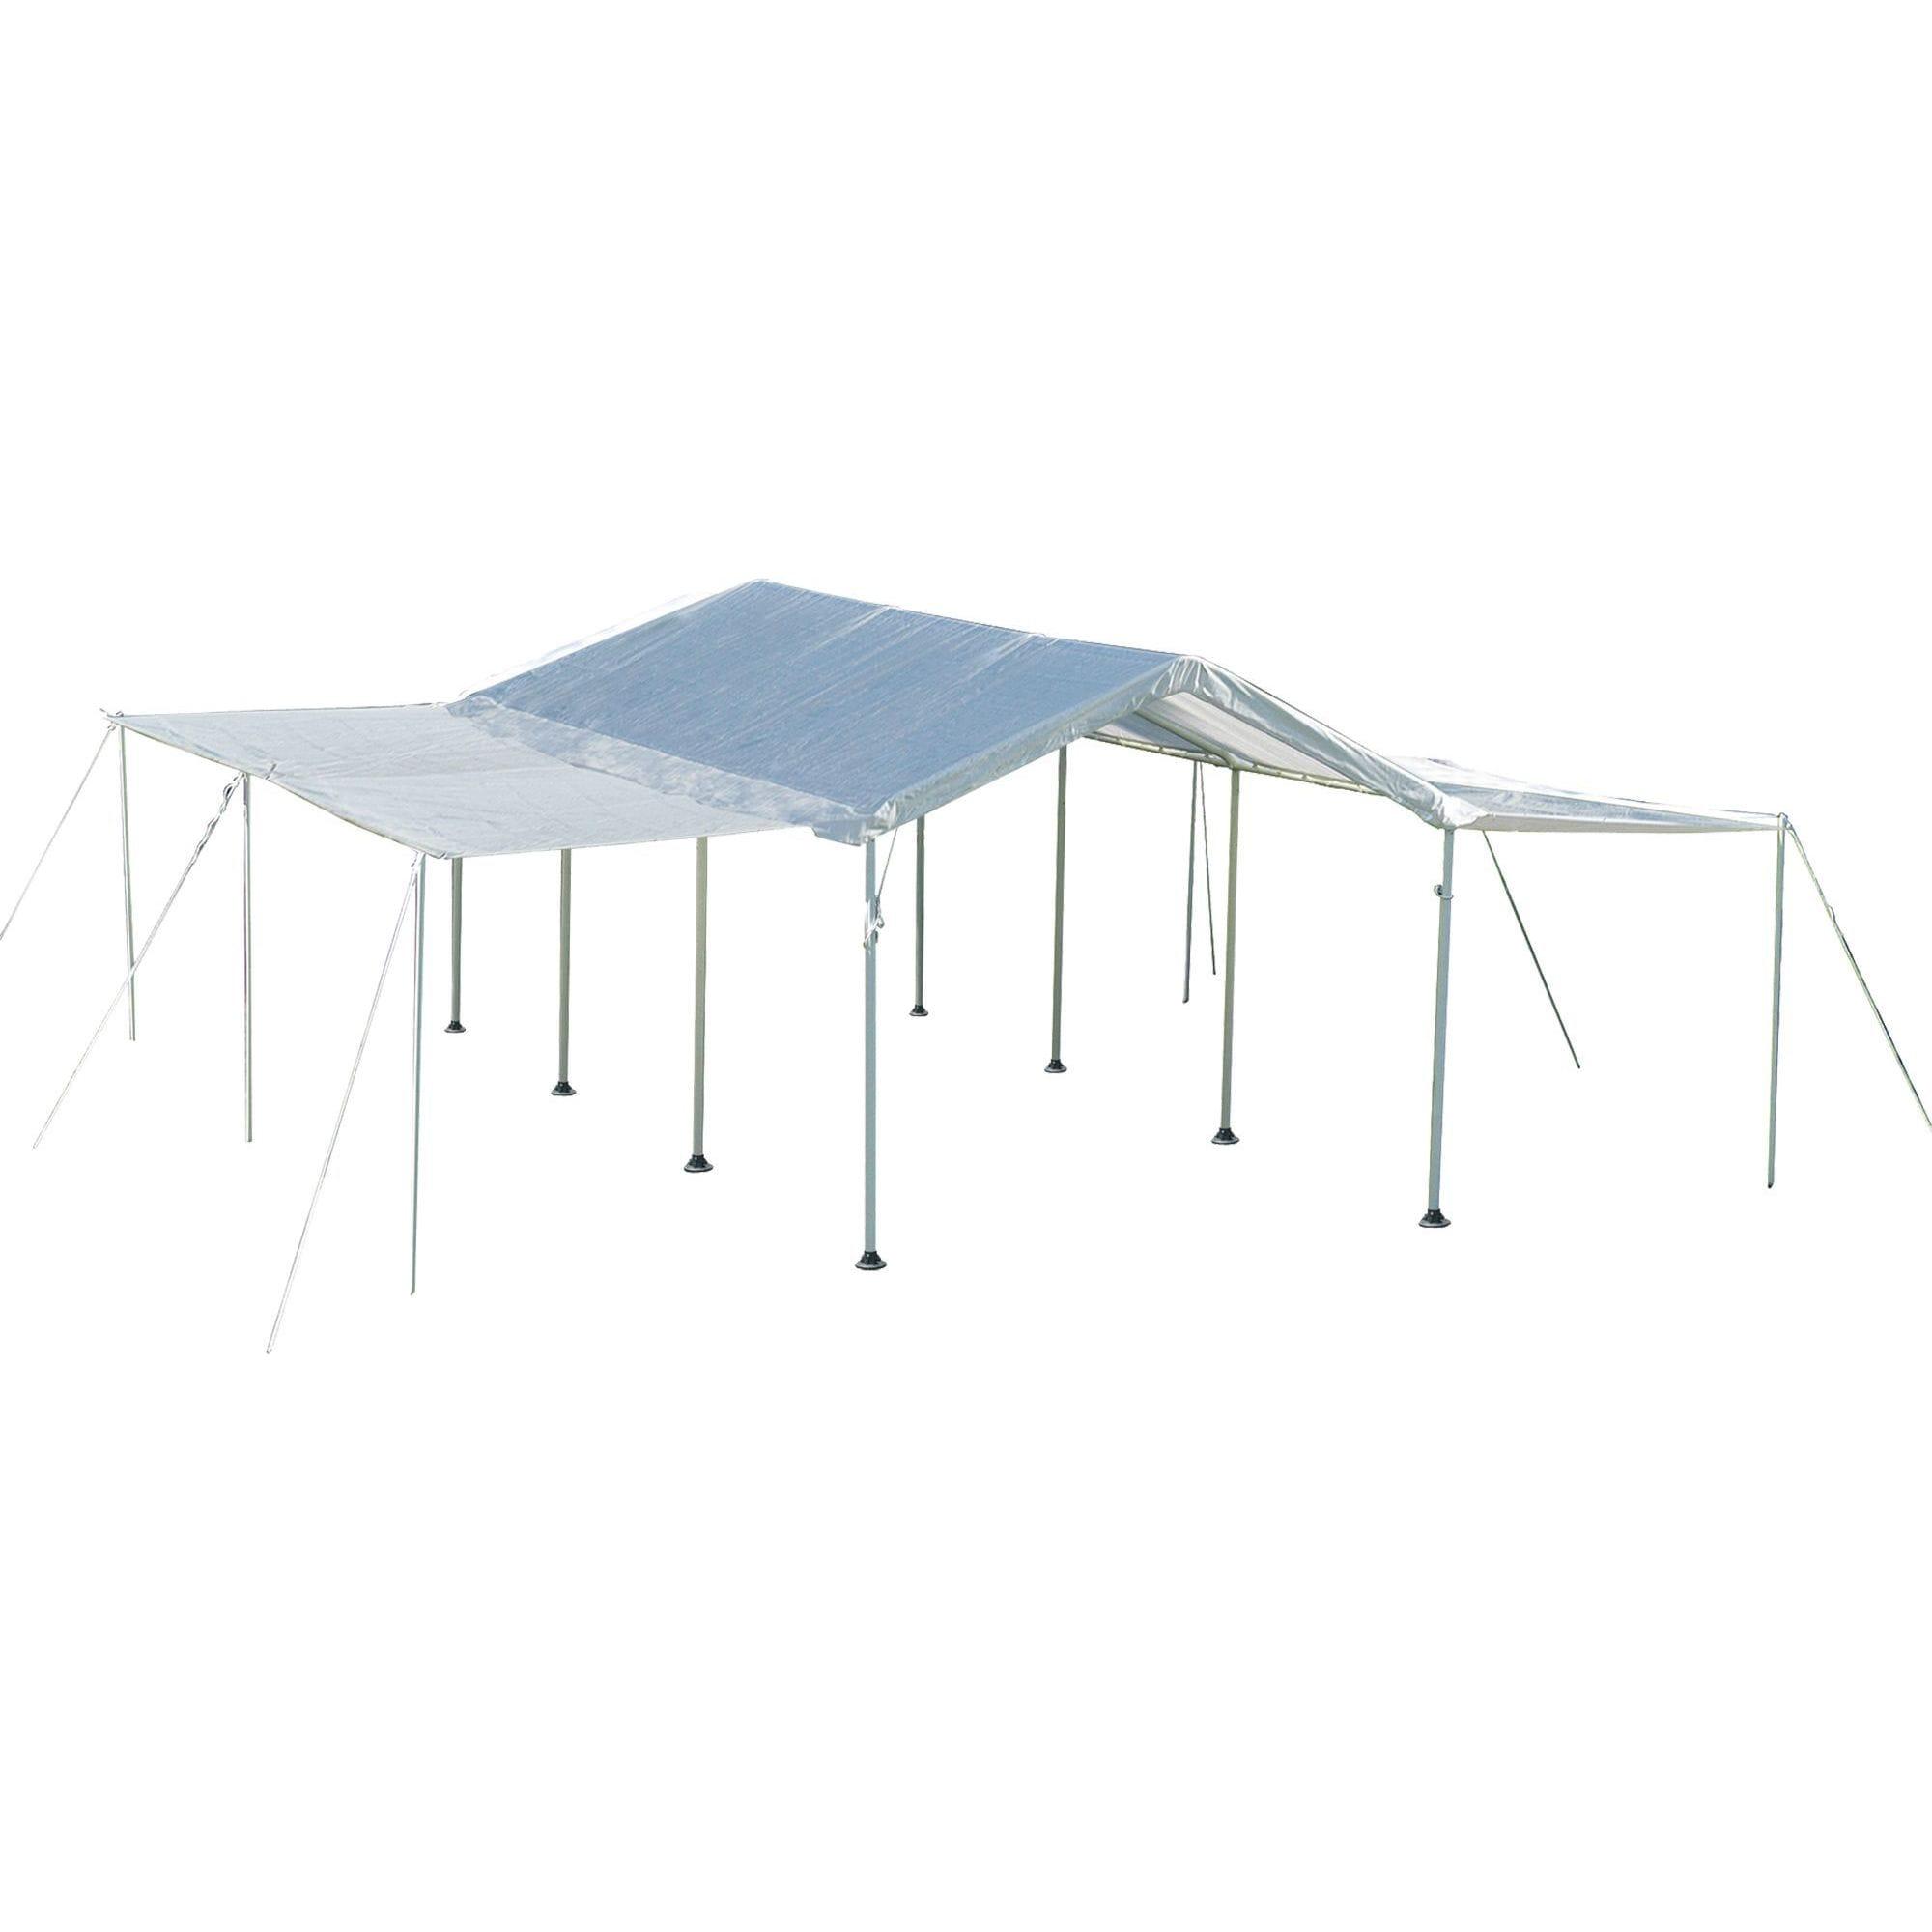 ShelterLogic 10 x 20ft. White Canopy Extension Sidewall K...